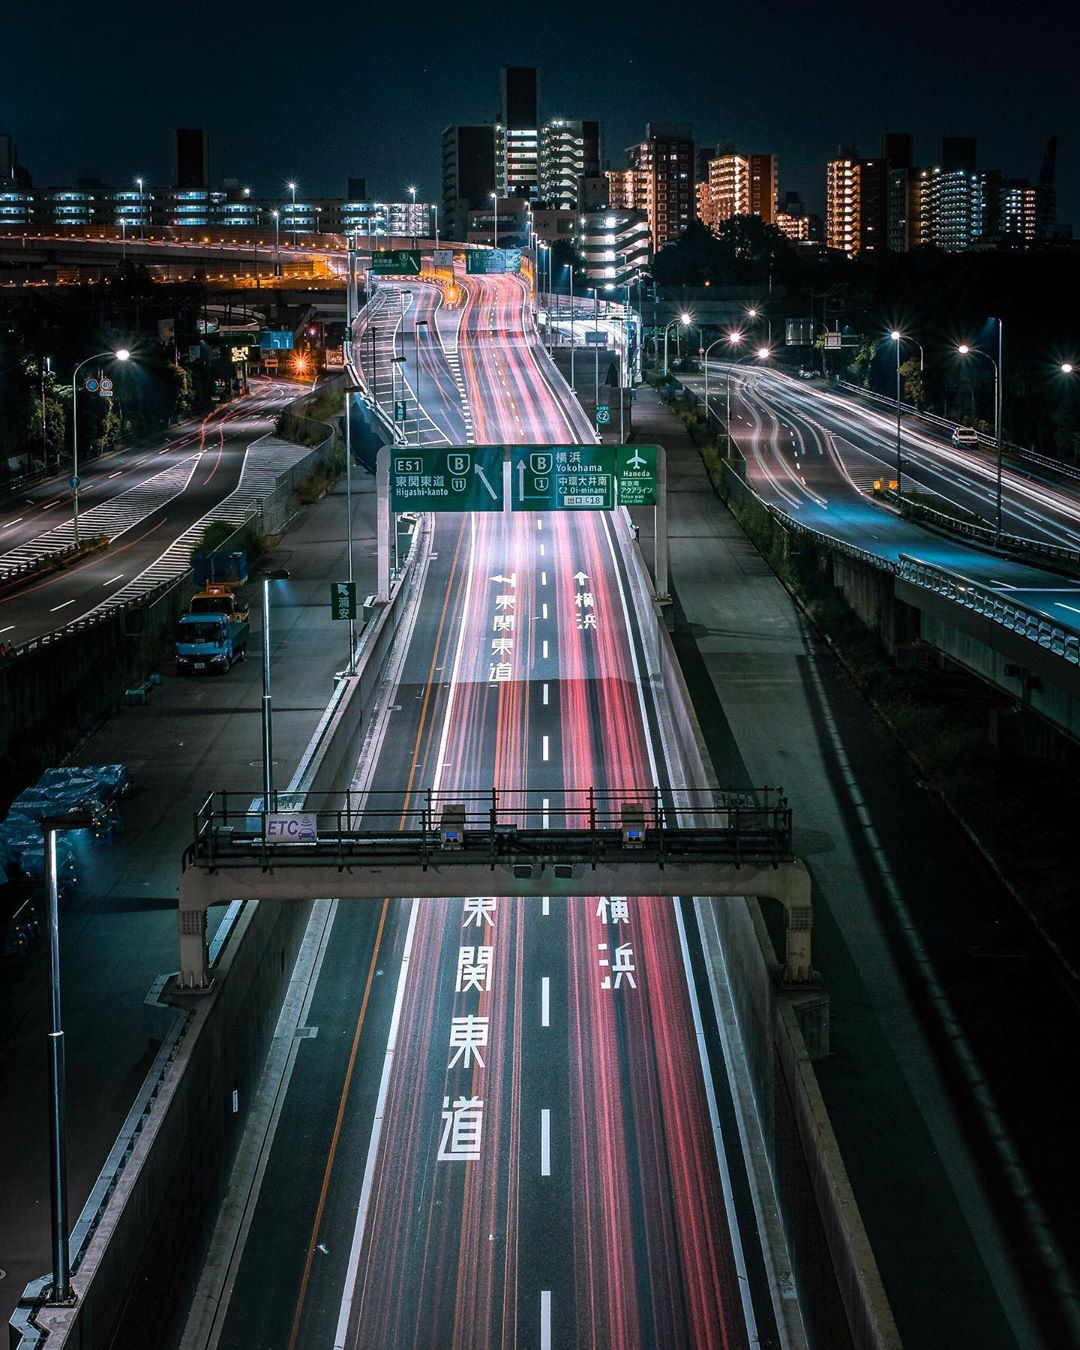 tokyo-nightlife-photography-hosokawa-ryohei-13